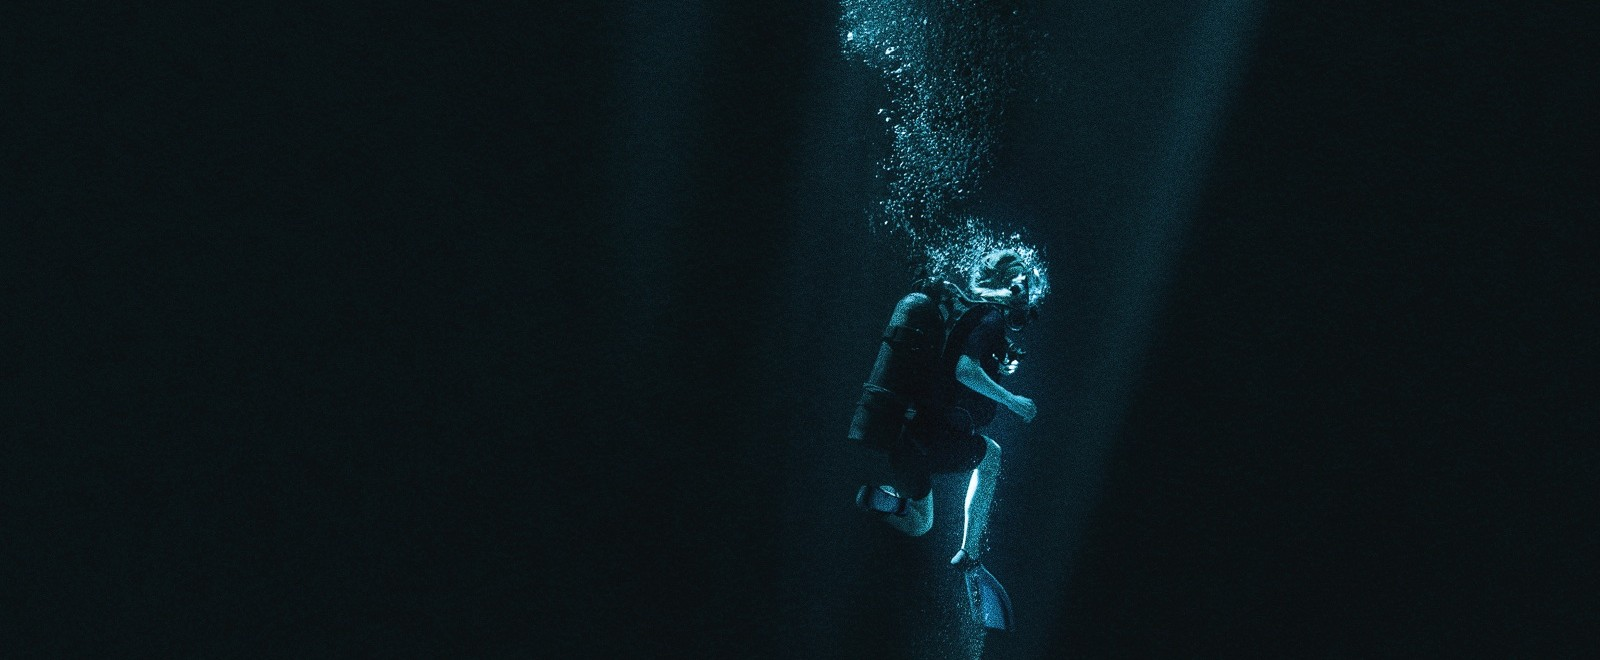 47 Meters Down Summer Movie Preview